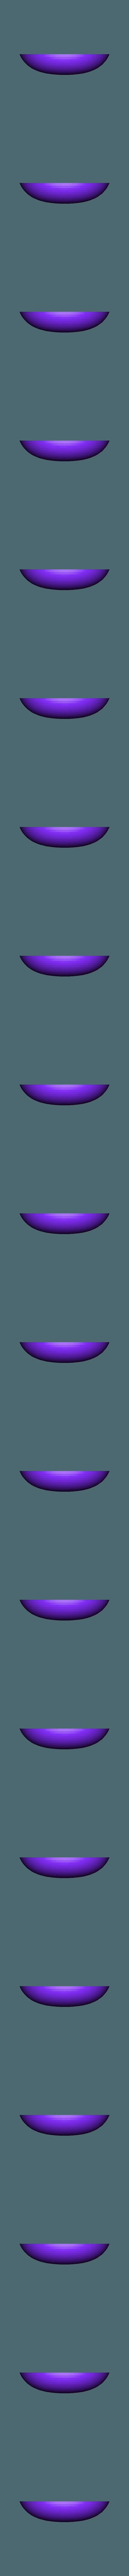 Trasparent_2_Headlights_Grill_Version.stl Descargar archivo STL CHEVY VAN G20 RC BODY SCALER AXIAL MST TRX4 RC4WD • Modelo para imprimir en 3D, ilyakapitonov